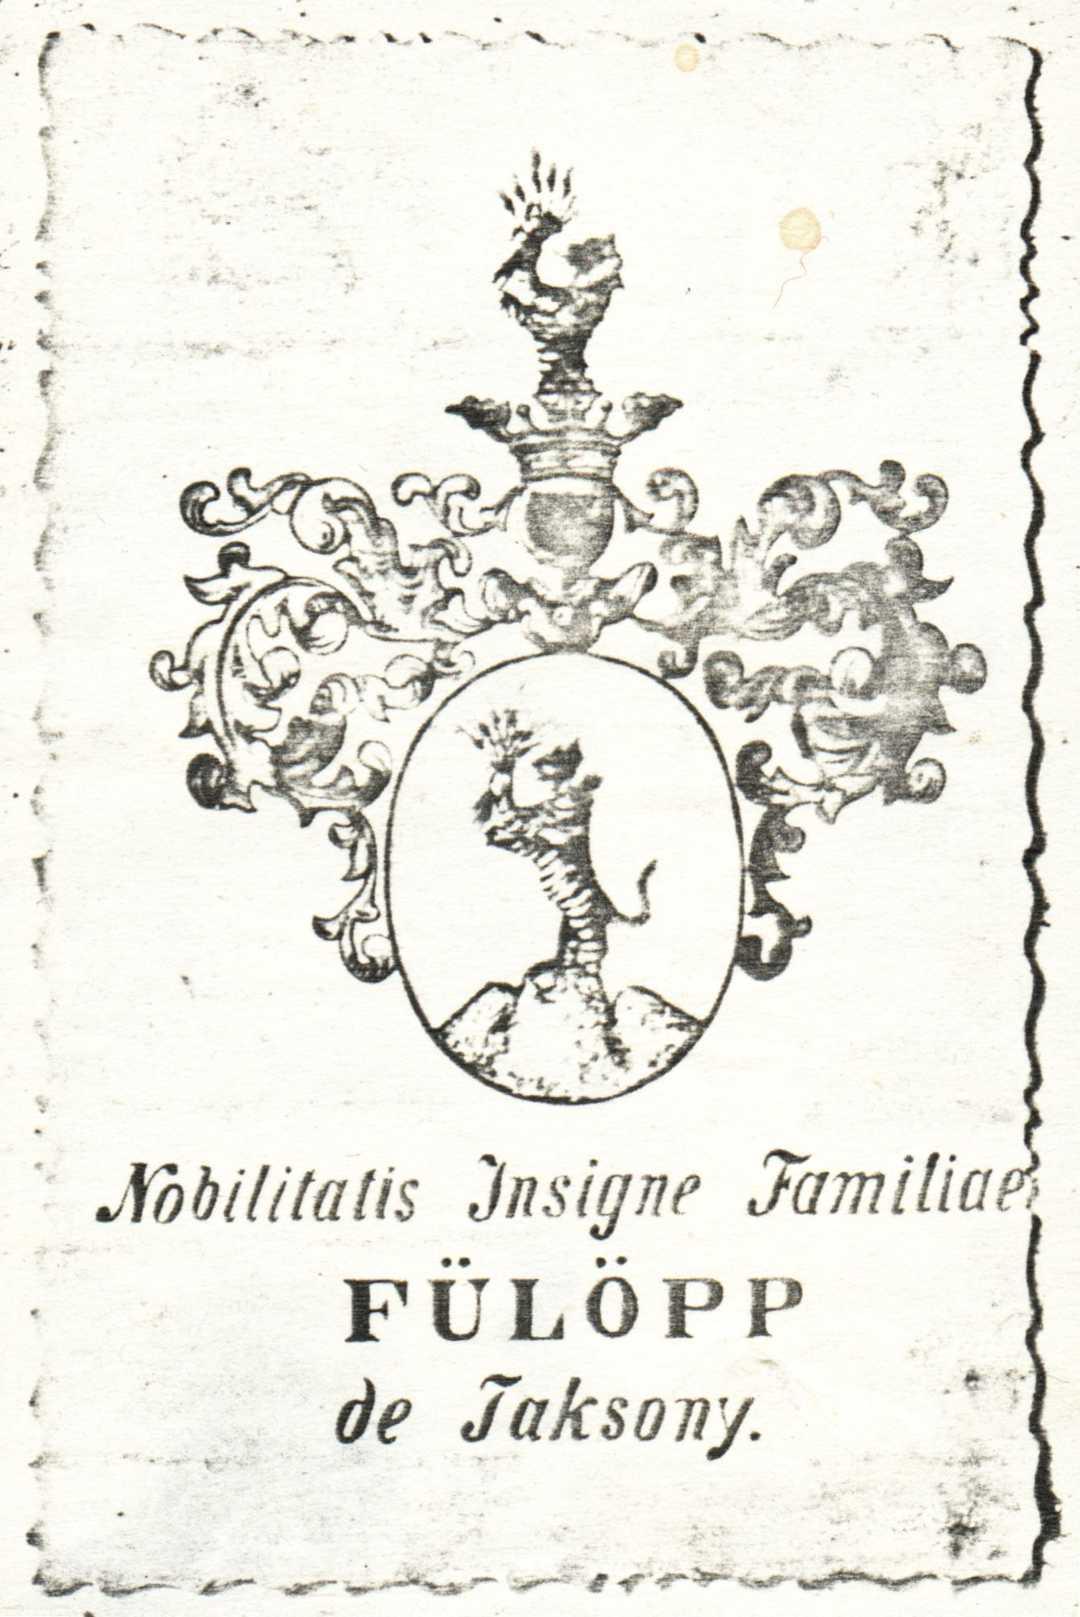 Fülöpp de Taksony coat of arms